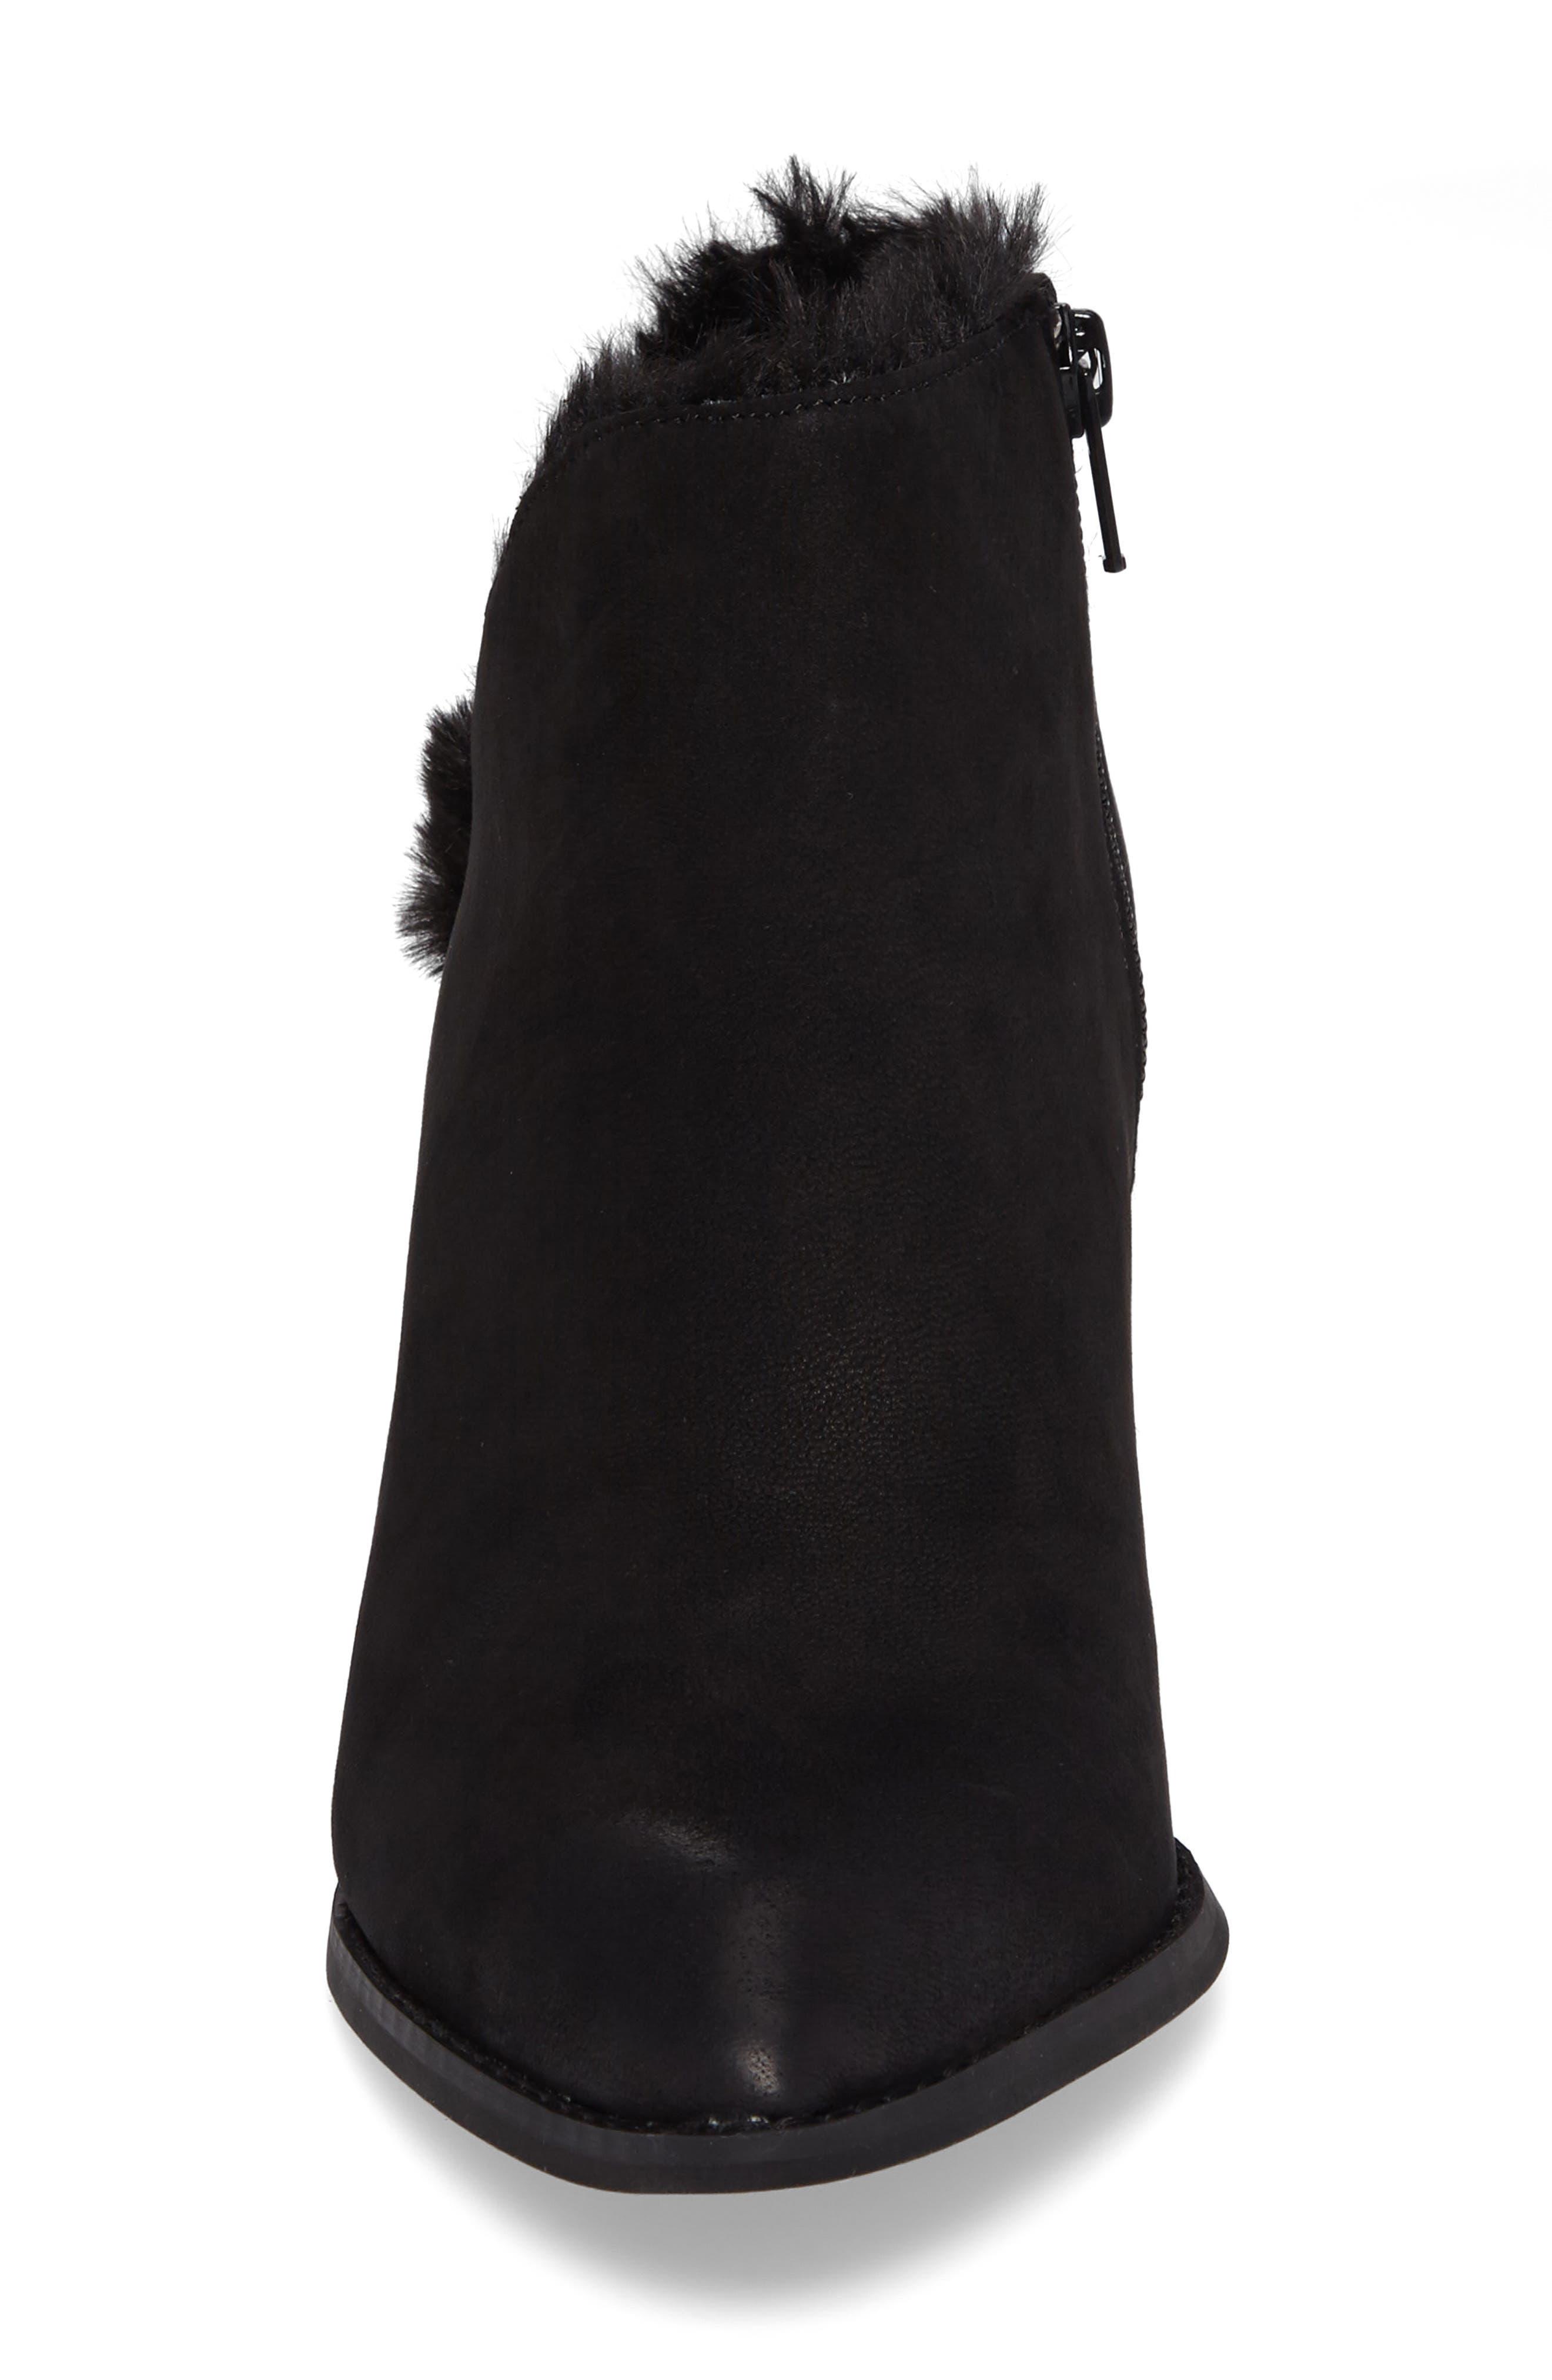 Preview Faux Fur Lined Bootie,                             Alternate thumbnail 4, color,                             Black Leather